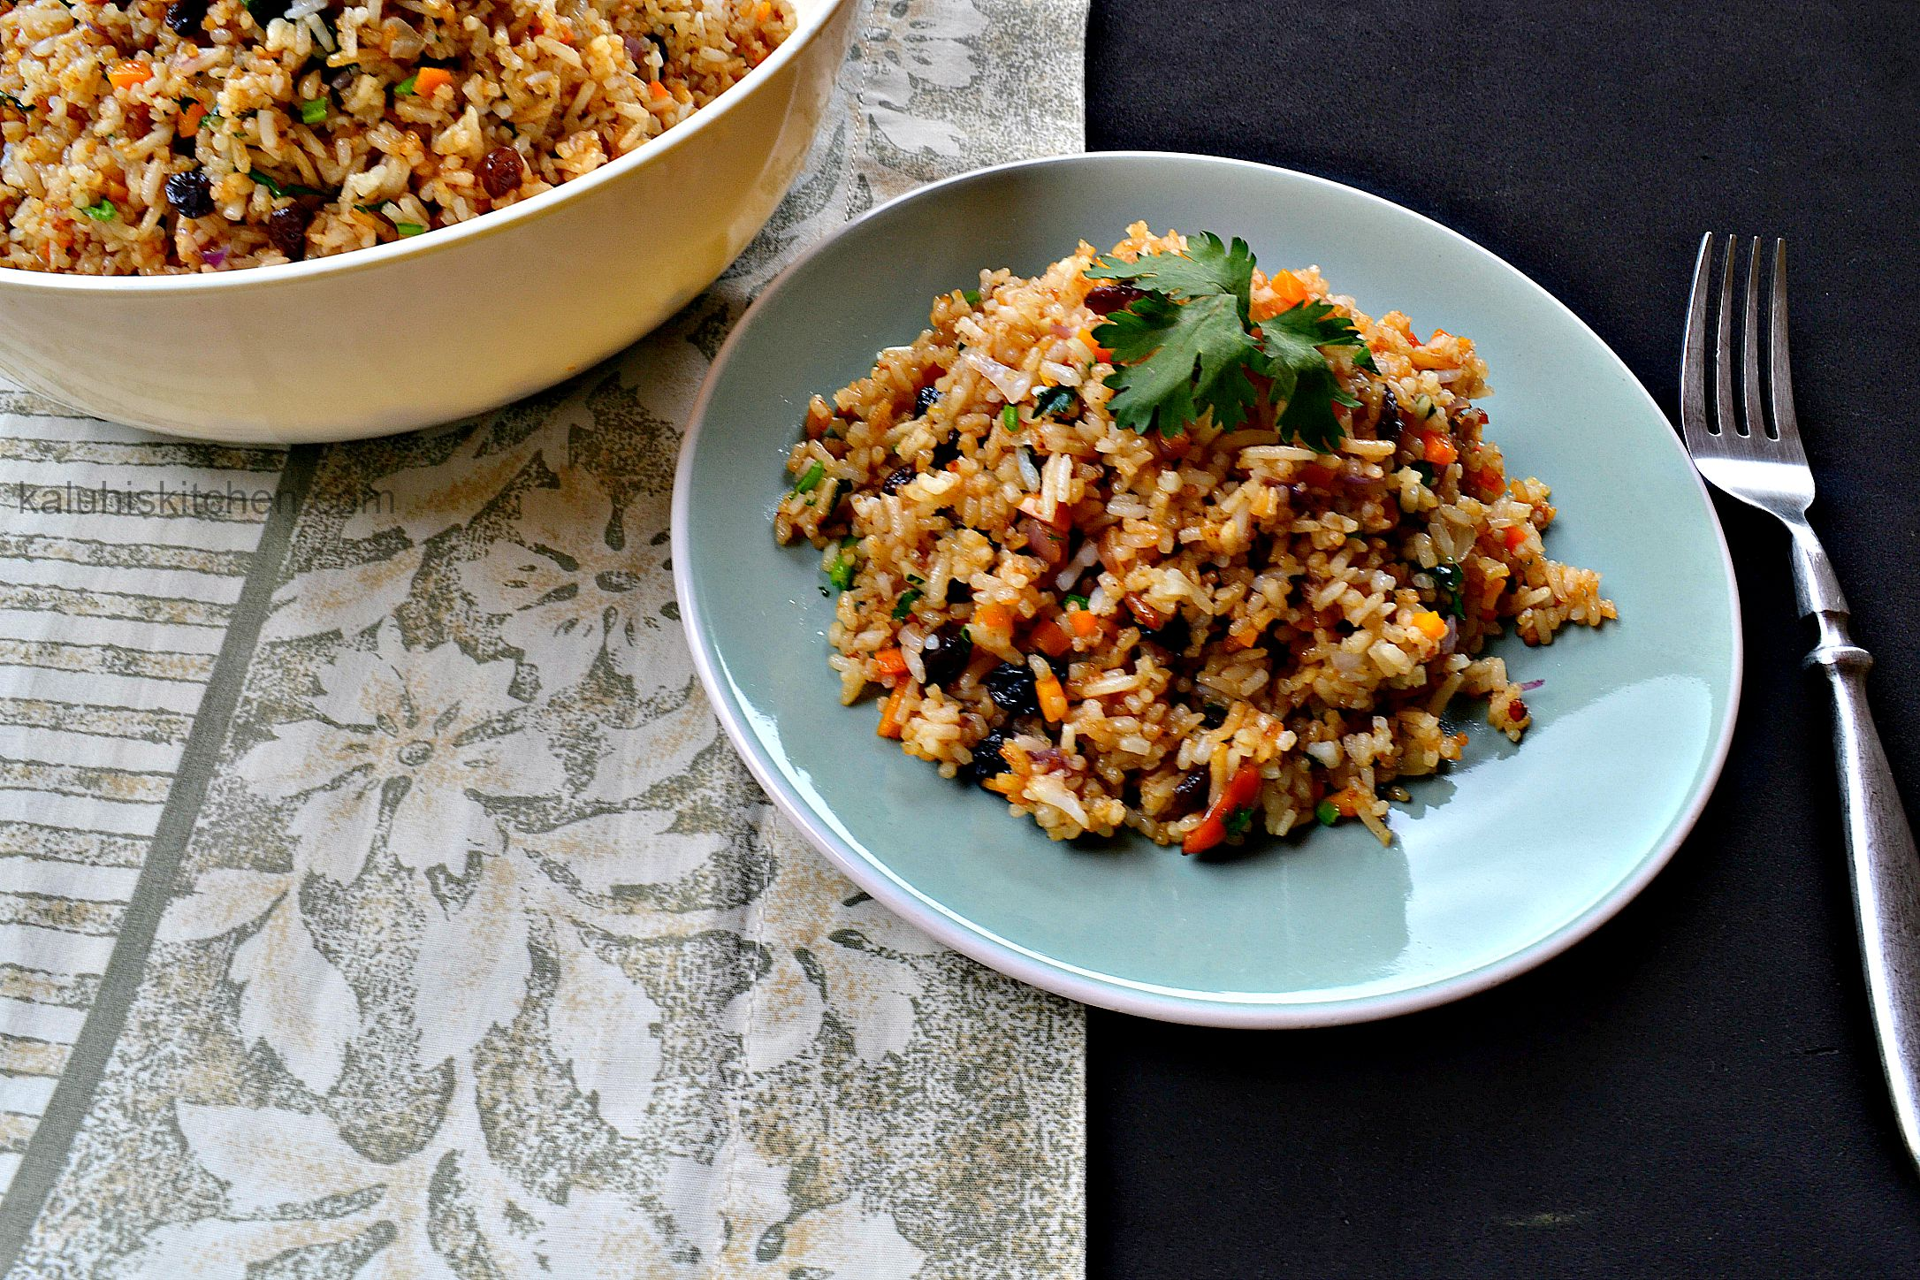 kenyan food blogs_best kenyan food blog_how to make fried rice with carrots and raisins_kaluhiskitchen.com